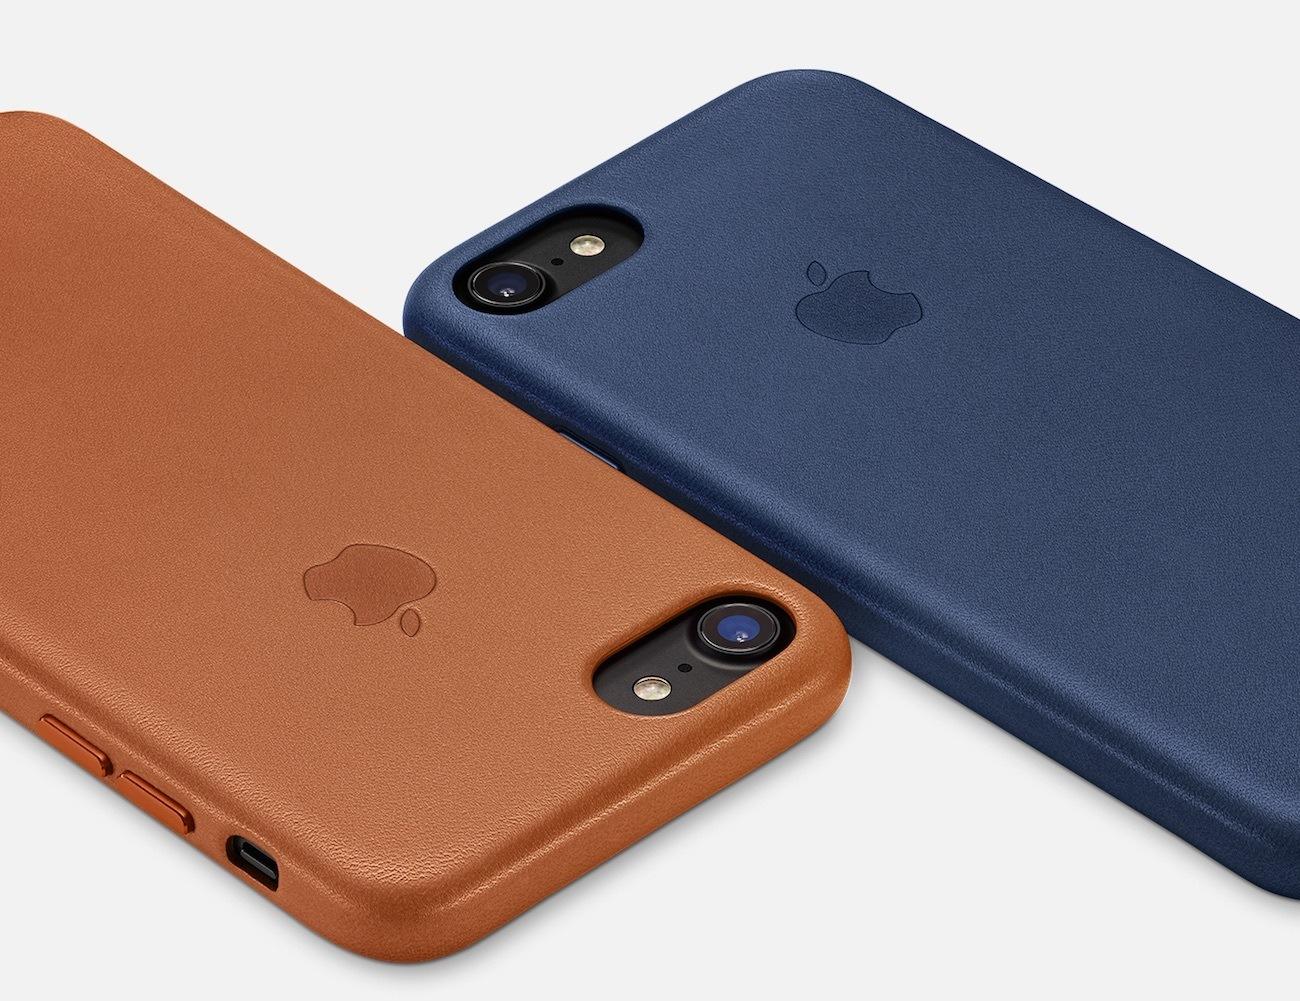 apple iphone leather case 7 plus